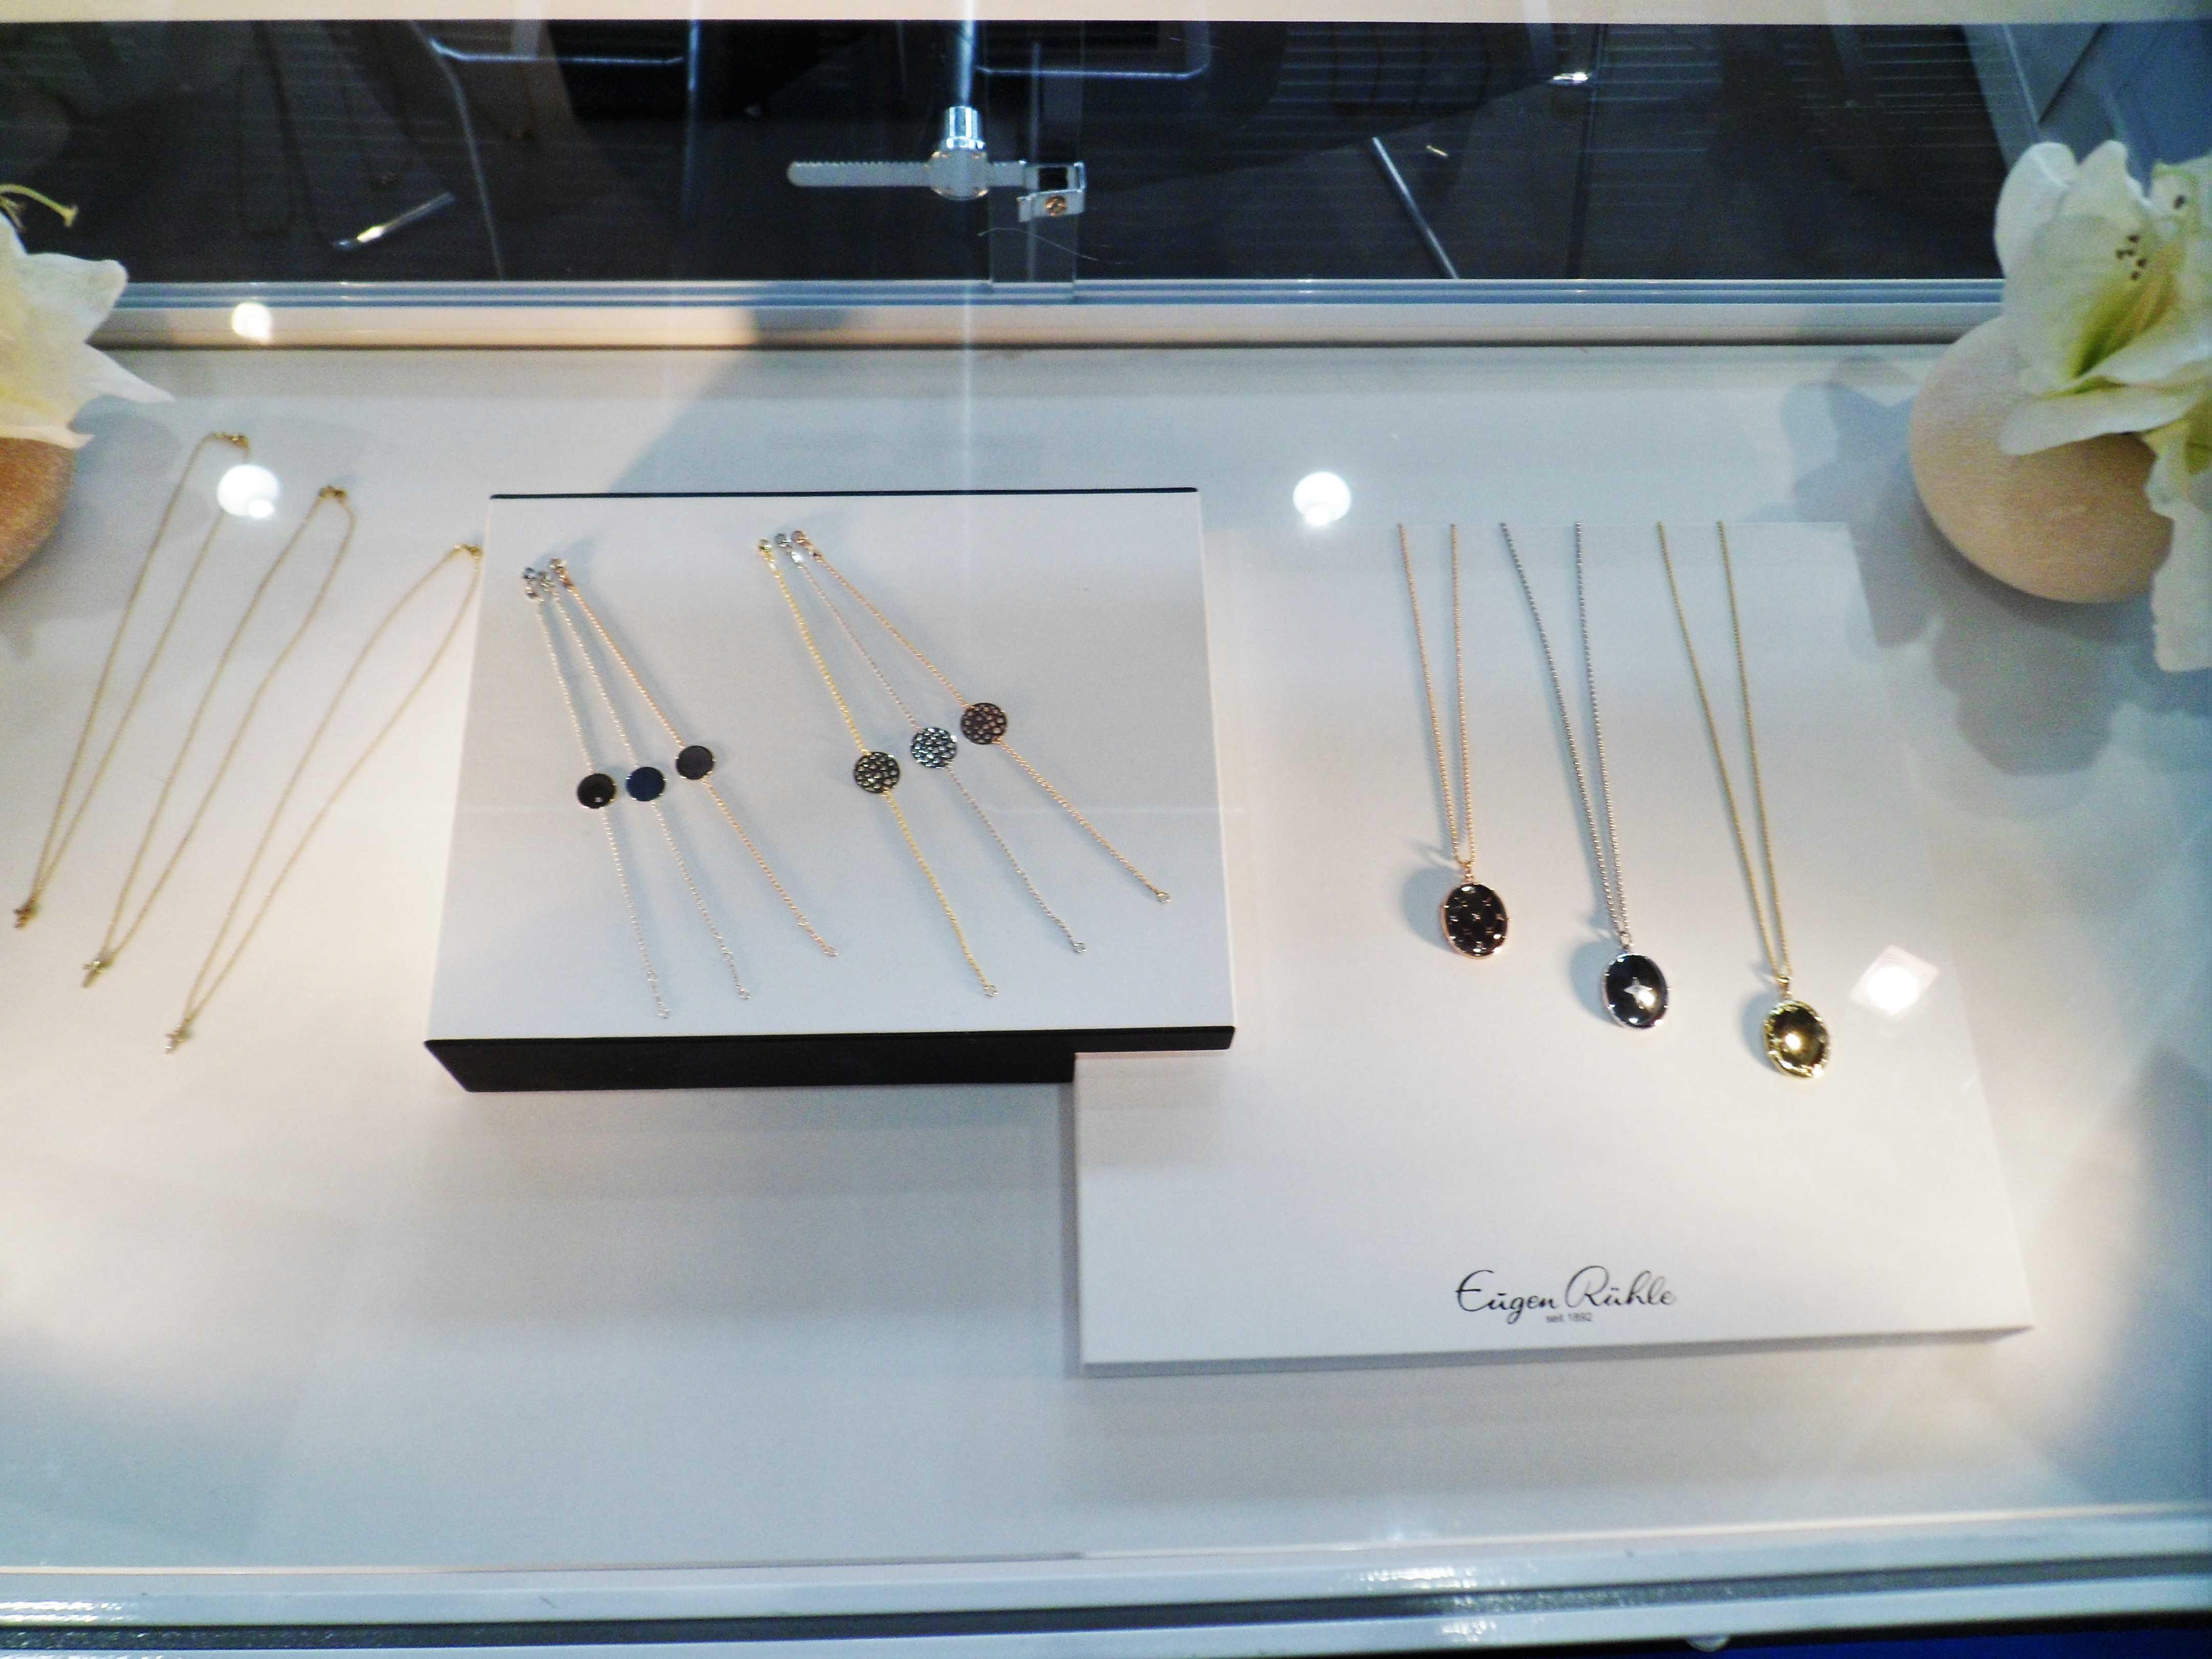 Messe Jewellery & Gem Fair Freiburg (1)